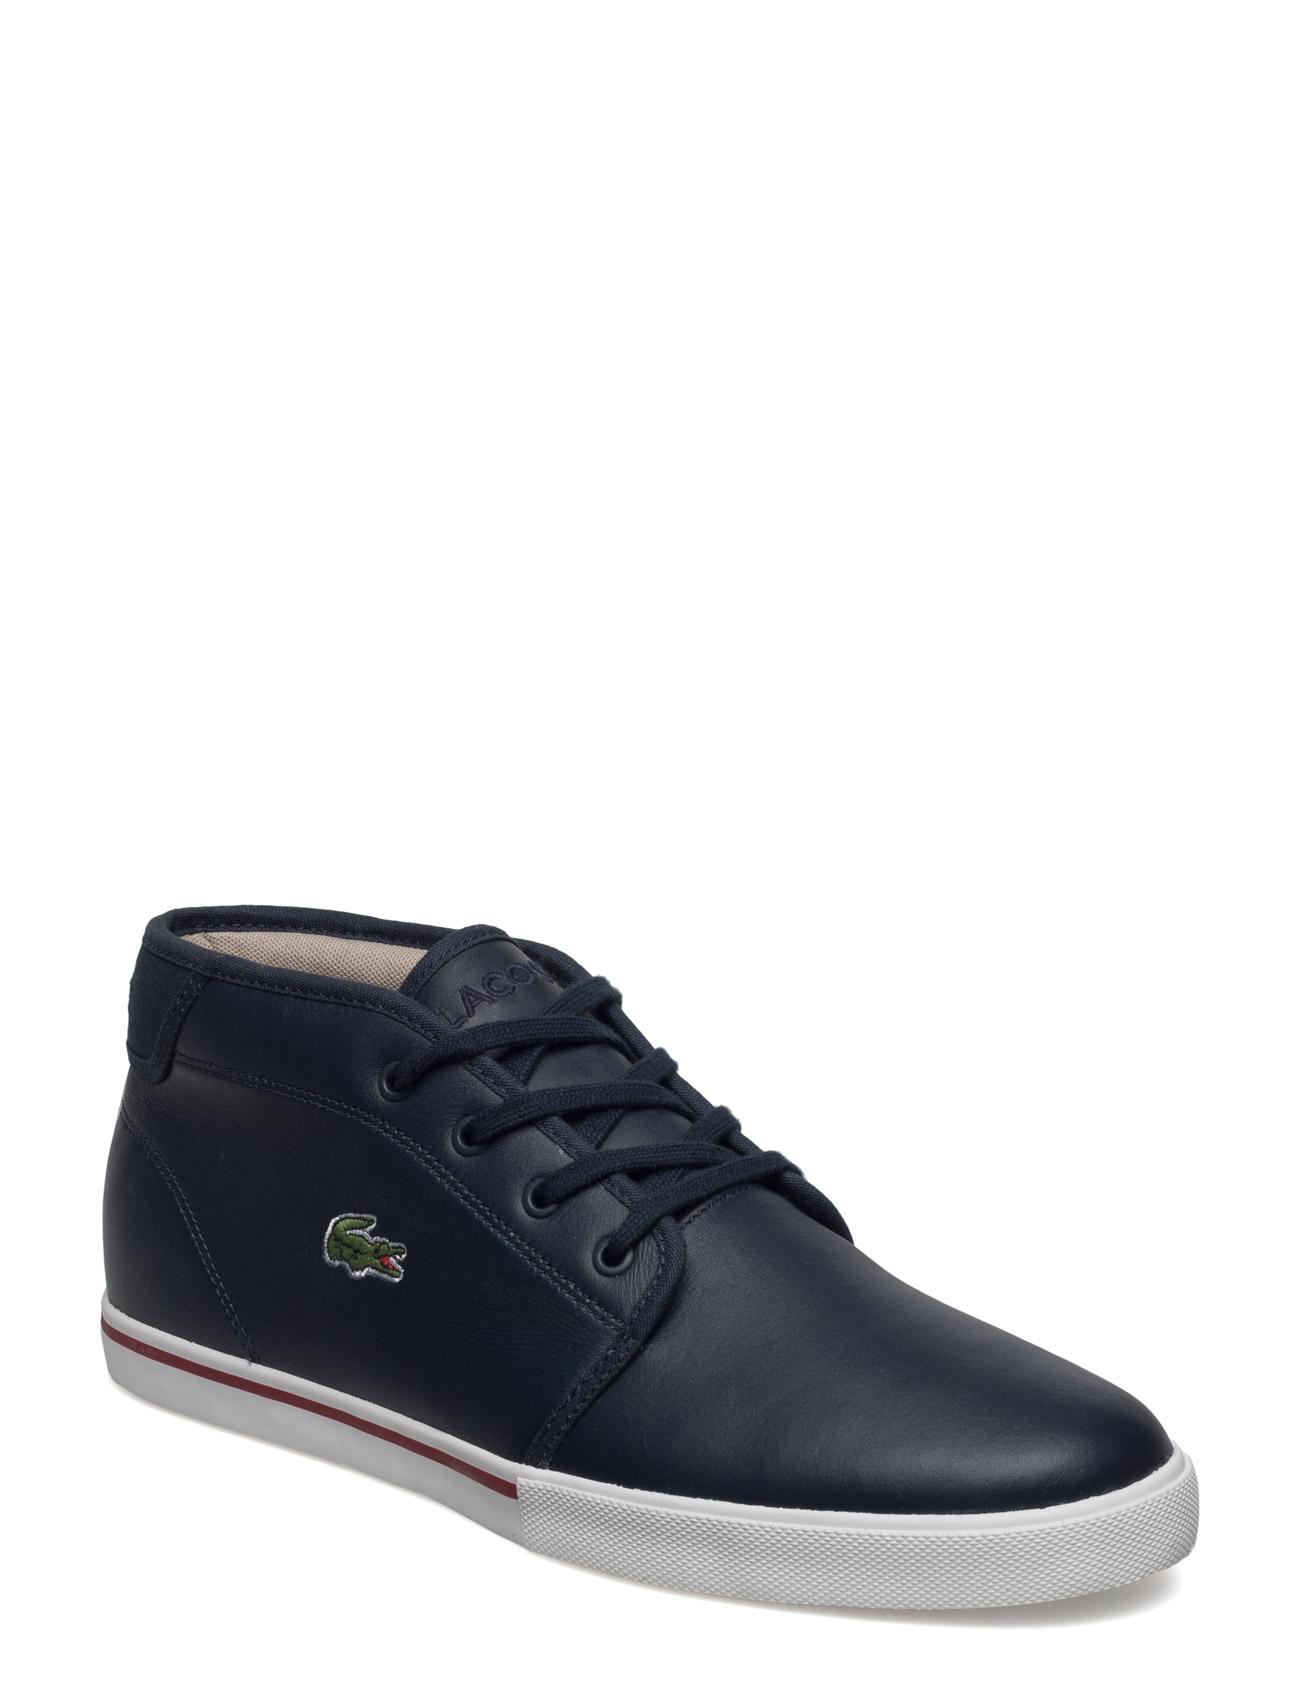 Ampthill 117 1 Lacoste Shoes Sneakers til Herrer i Navy blå